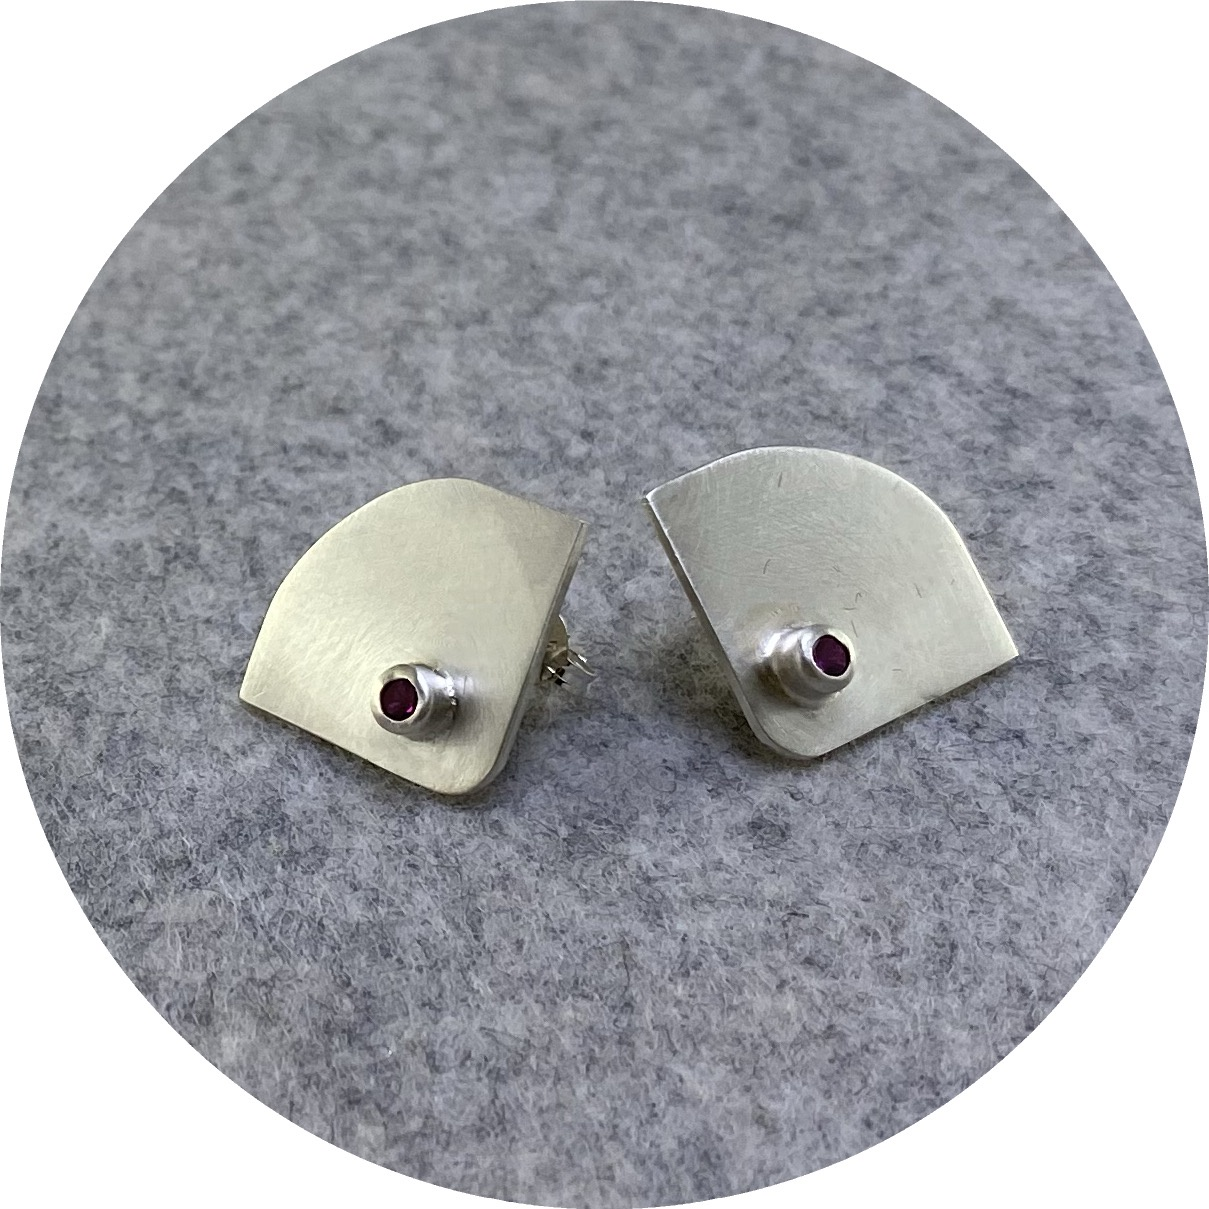 Rengin Guner - 'Cubic Zirconia Earrings', 925 silver, cz